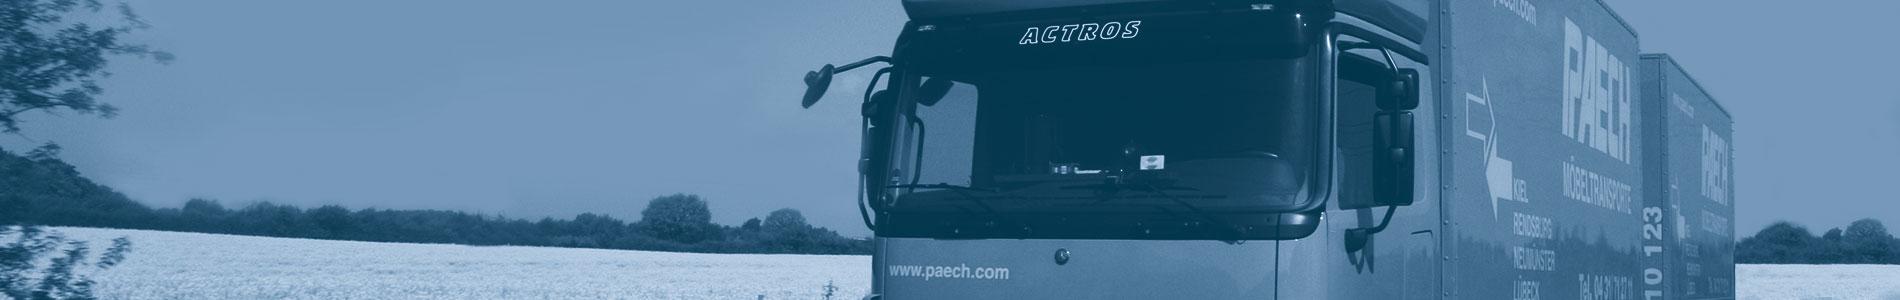 Ute Paech GmbH & Co. KG - Umzug Privat